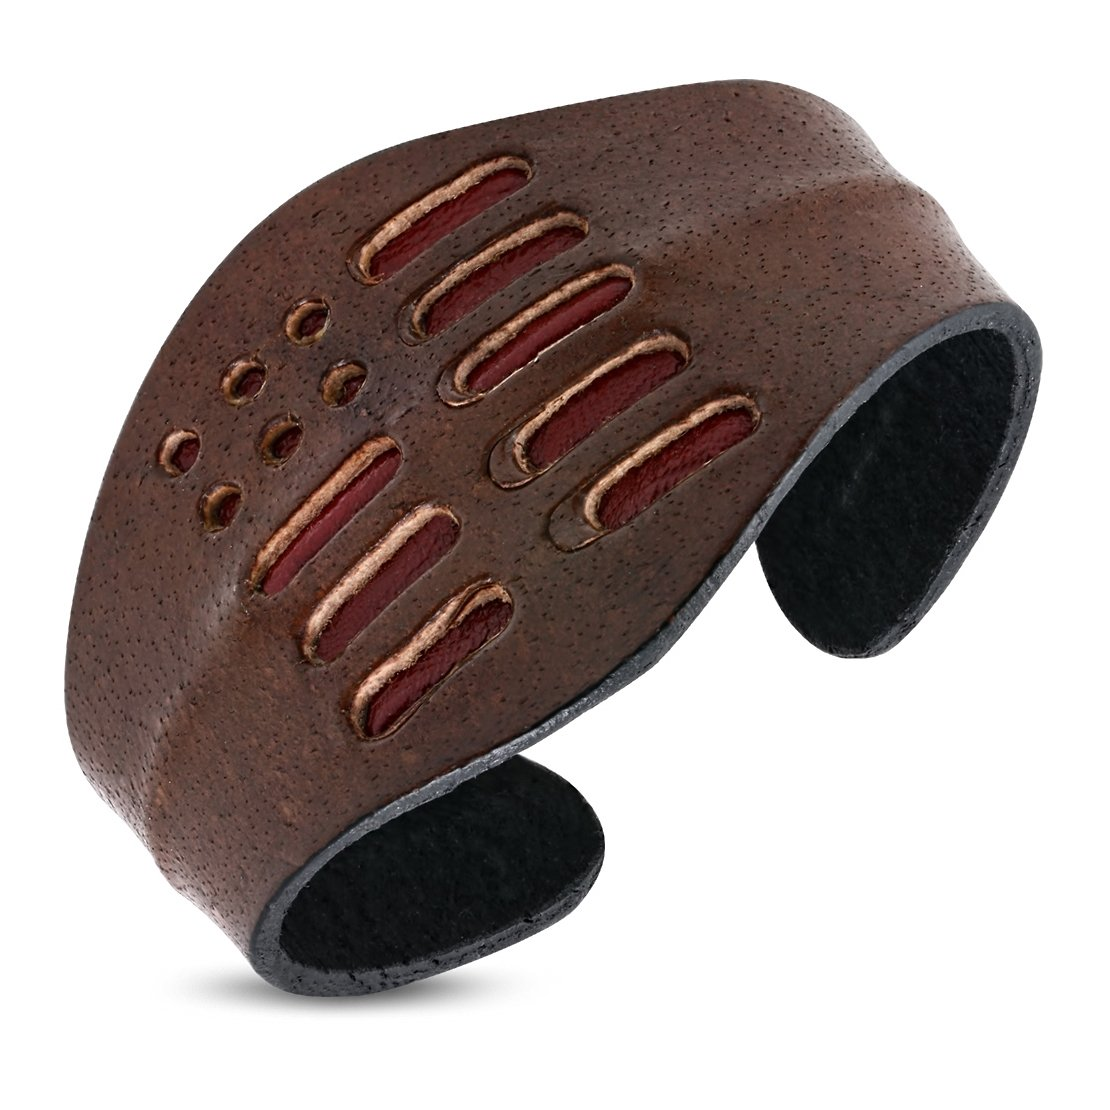 6.8 Genuine Brown Leather Geometric Diagonal Cuff Bangle Length